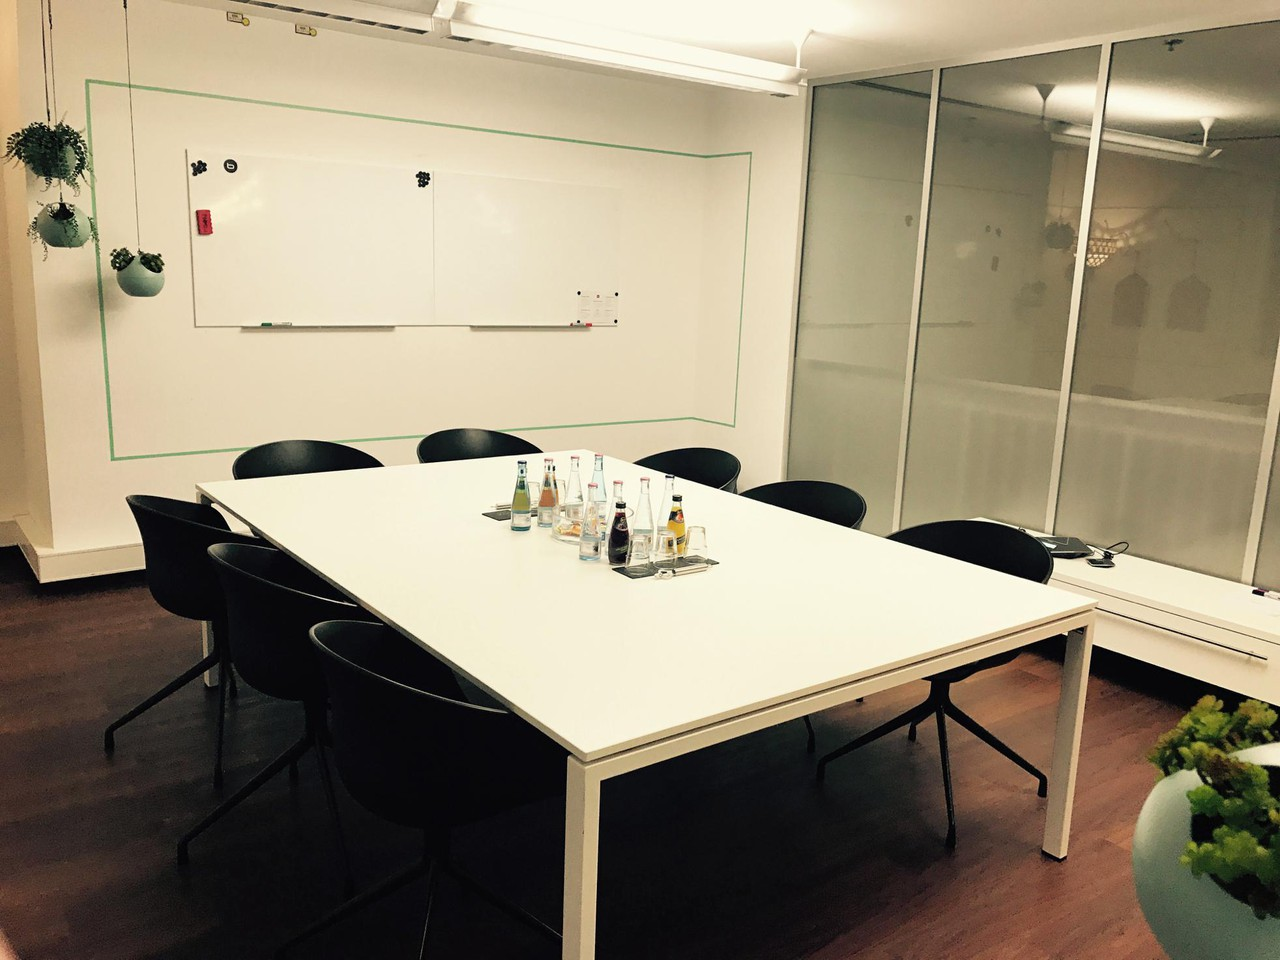 Berlin  Salle de réunion Meetingraum grün image 0